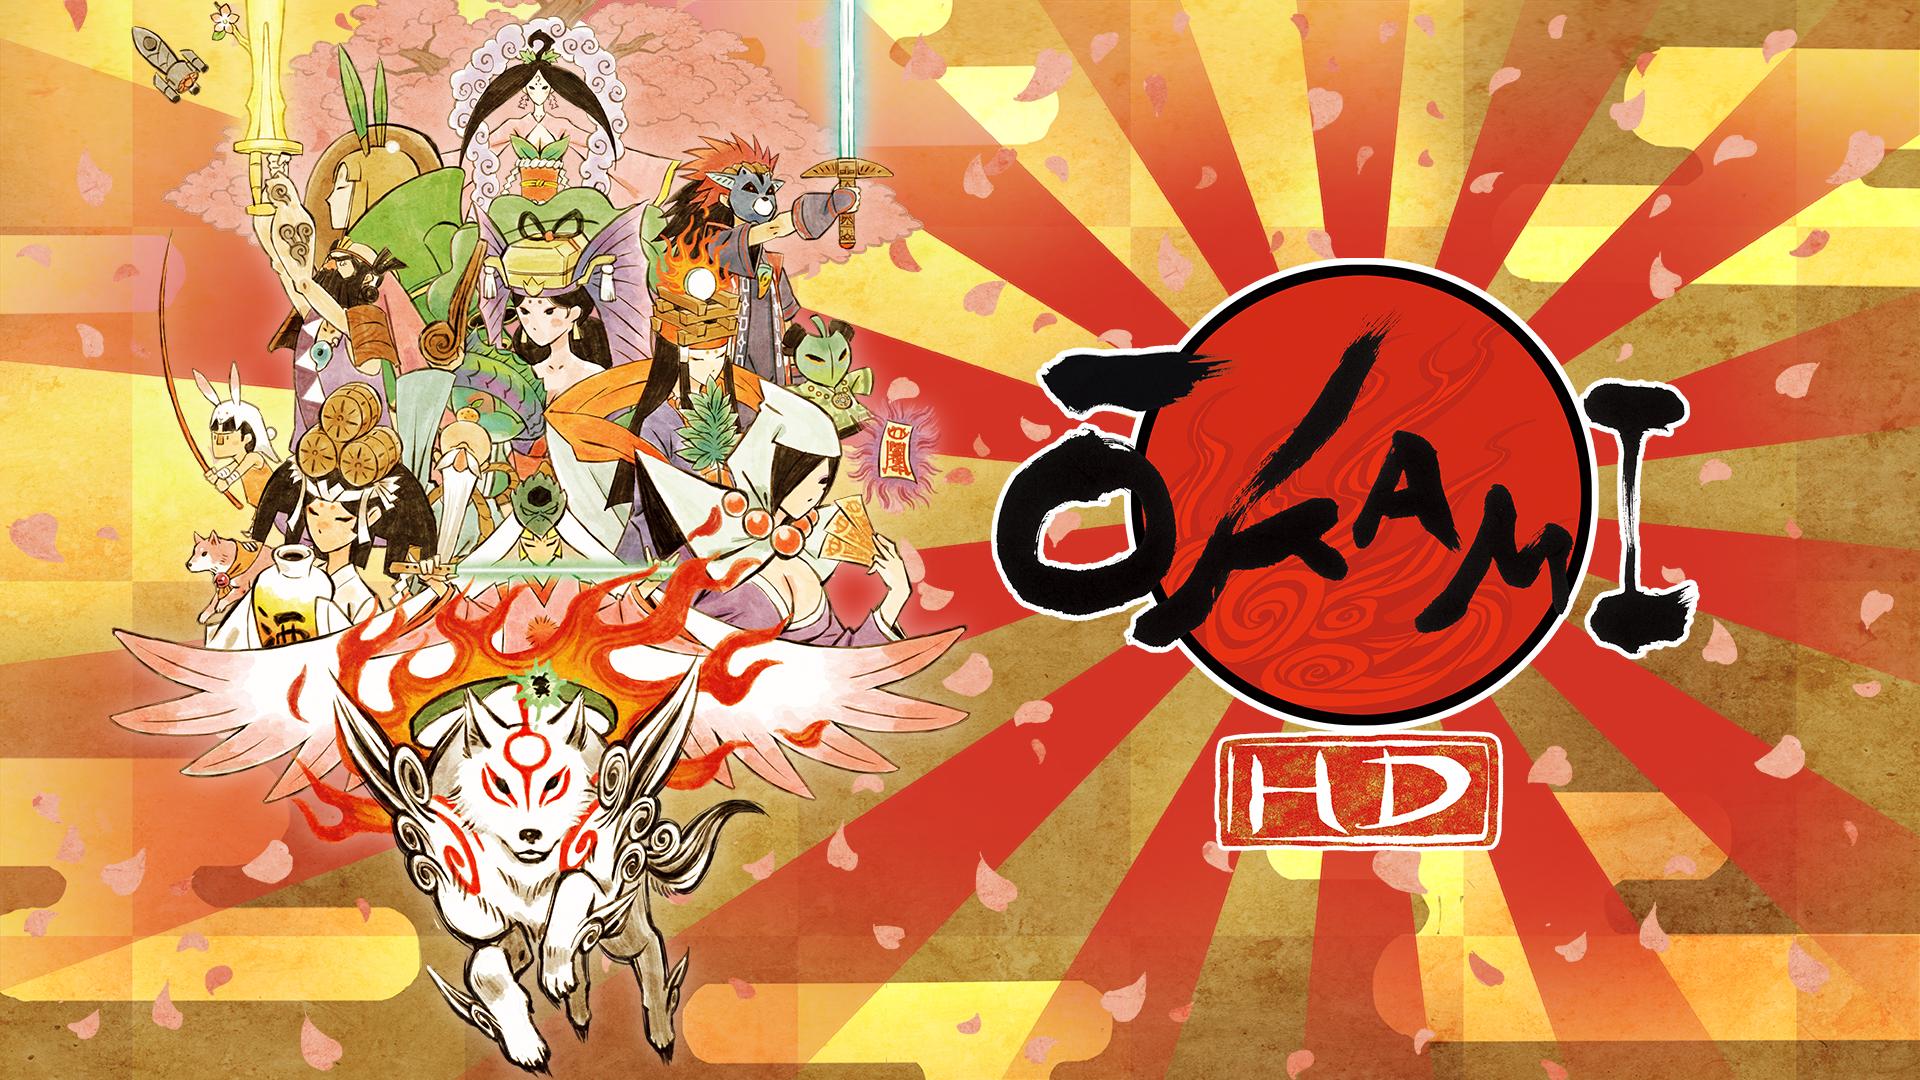 OKAMI HD - Nintendo Switch Digital Download - $9.99 @ Nintendo Game Store